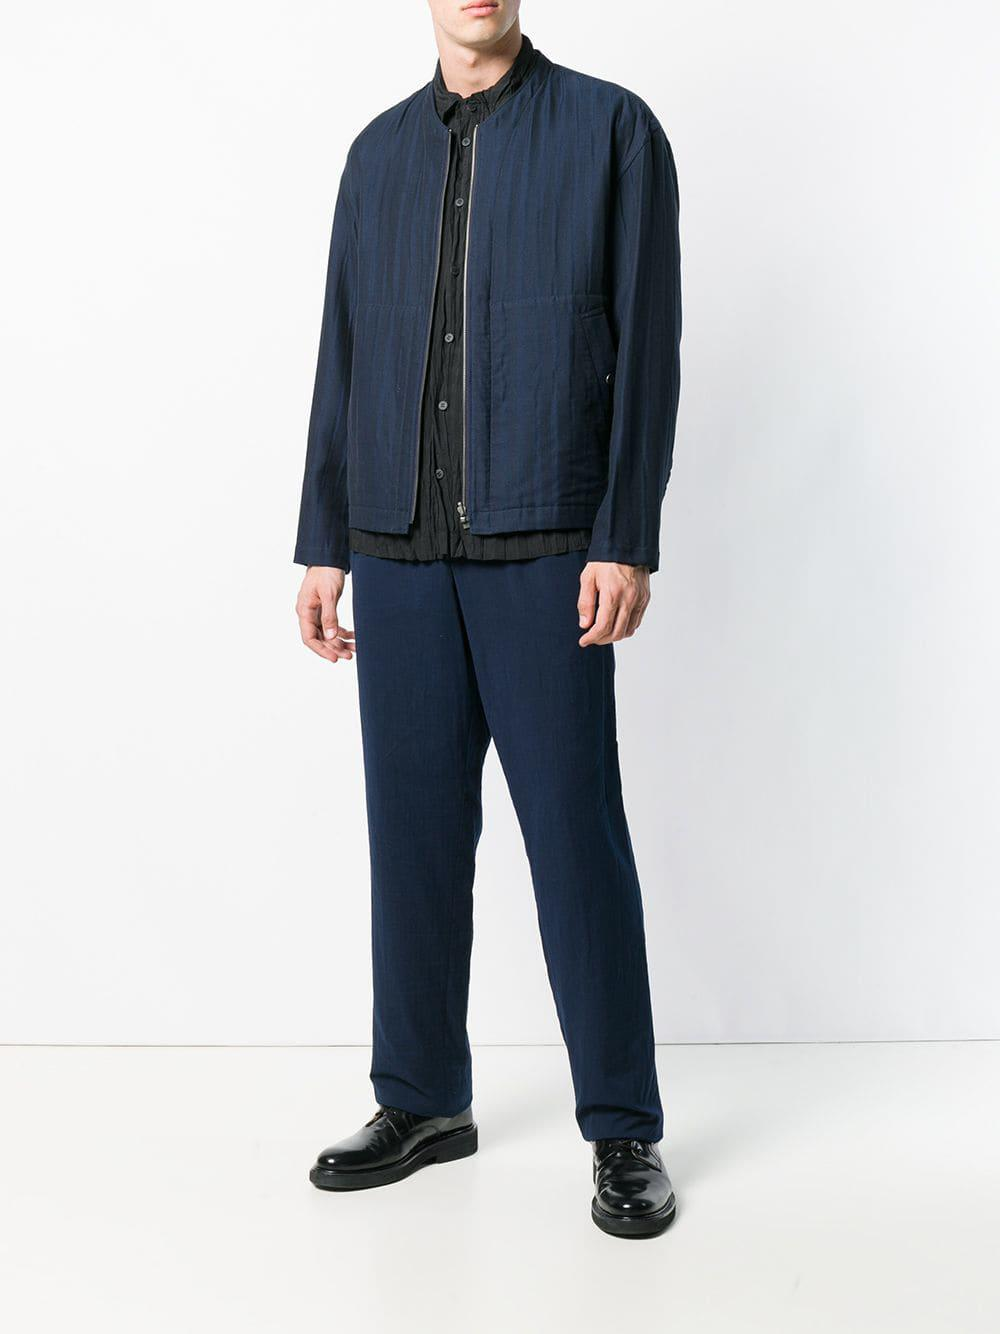 Issey Miyake Cotton Reversible Jacket in Blue for Men